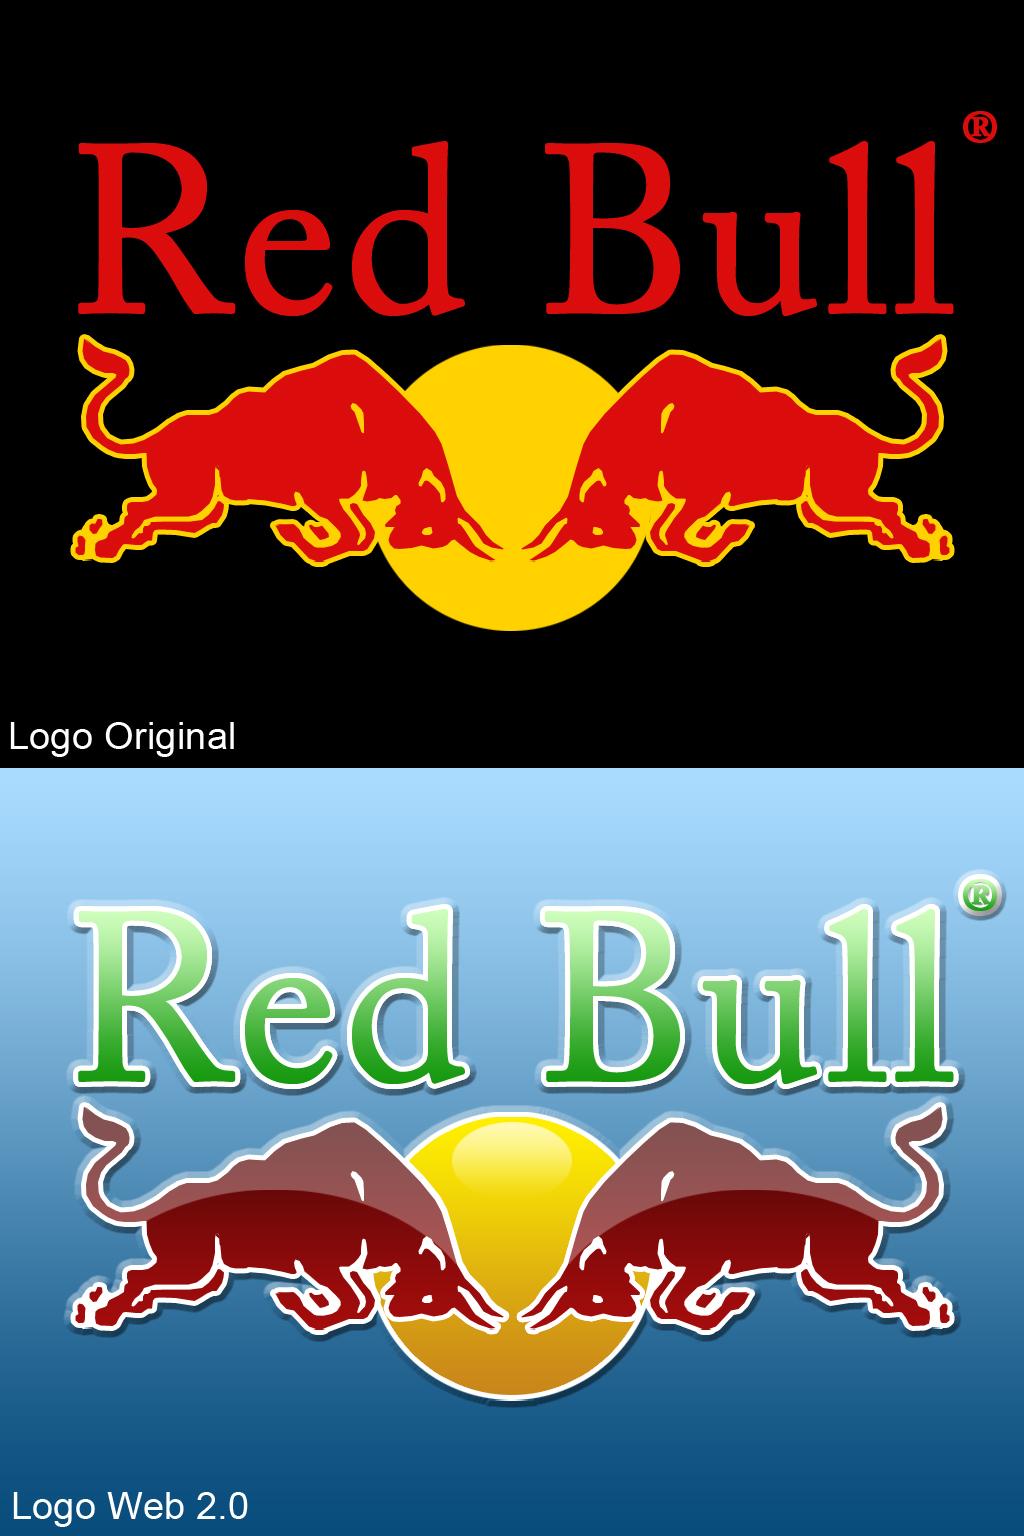 http://1.bp.blogspot.com/-JqrCzDJguN4/Tdgny5cq0CI/AAAAAAAAUjY/cCf0A5F_MBk/s1600/redbull_logo1.jpg